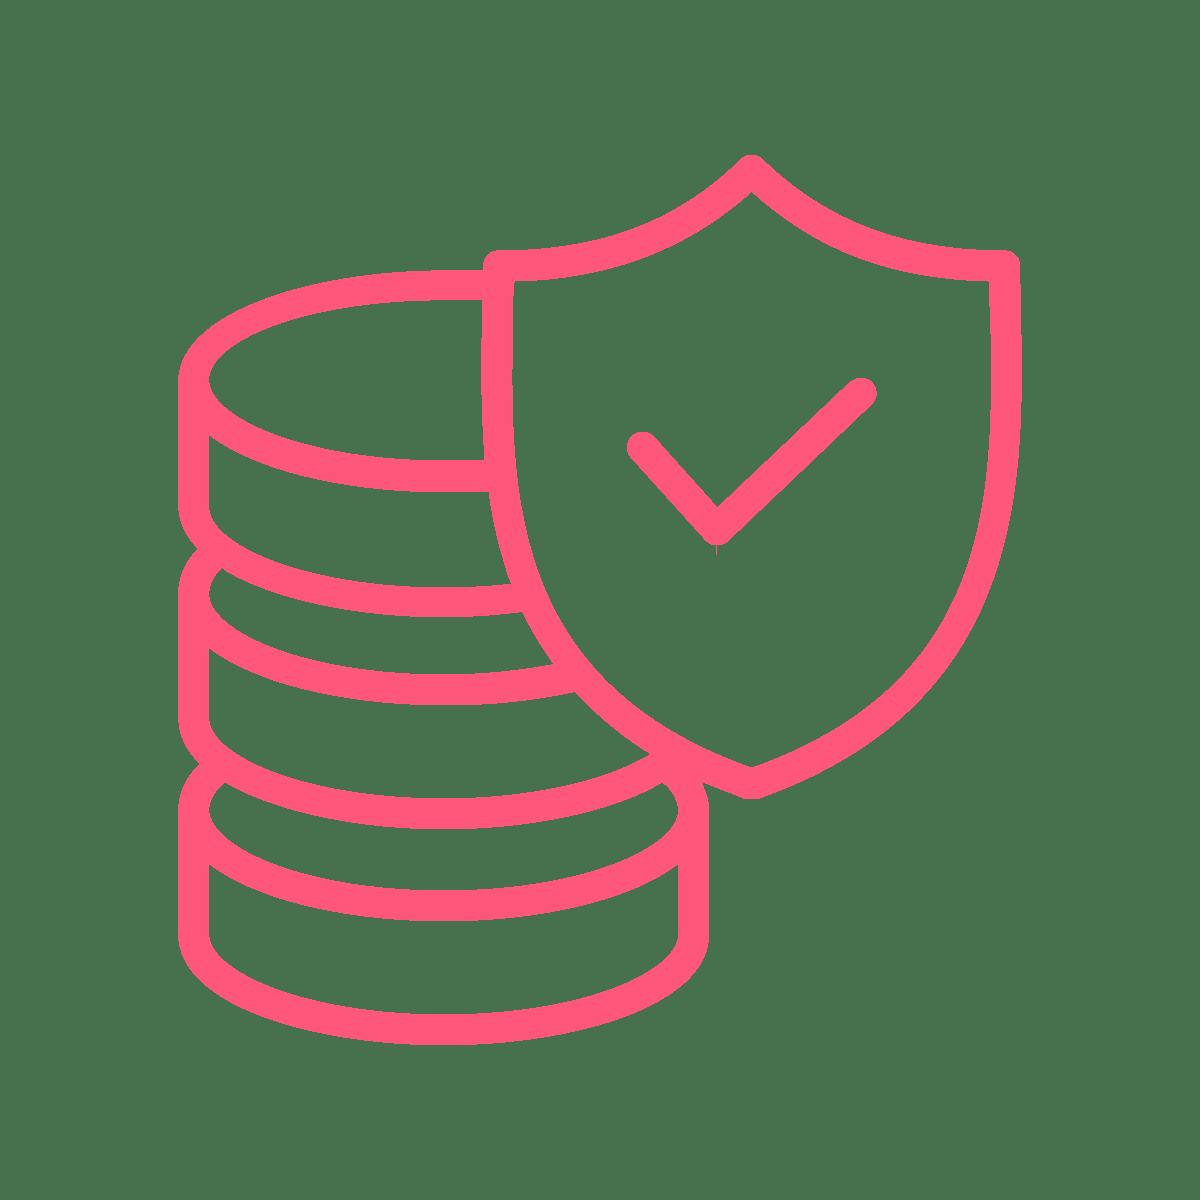 ClinikNote Secure Storage